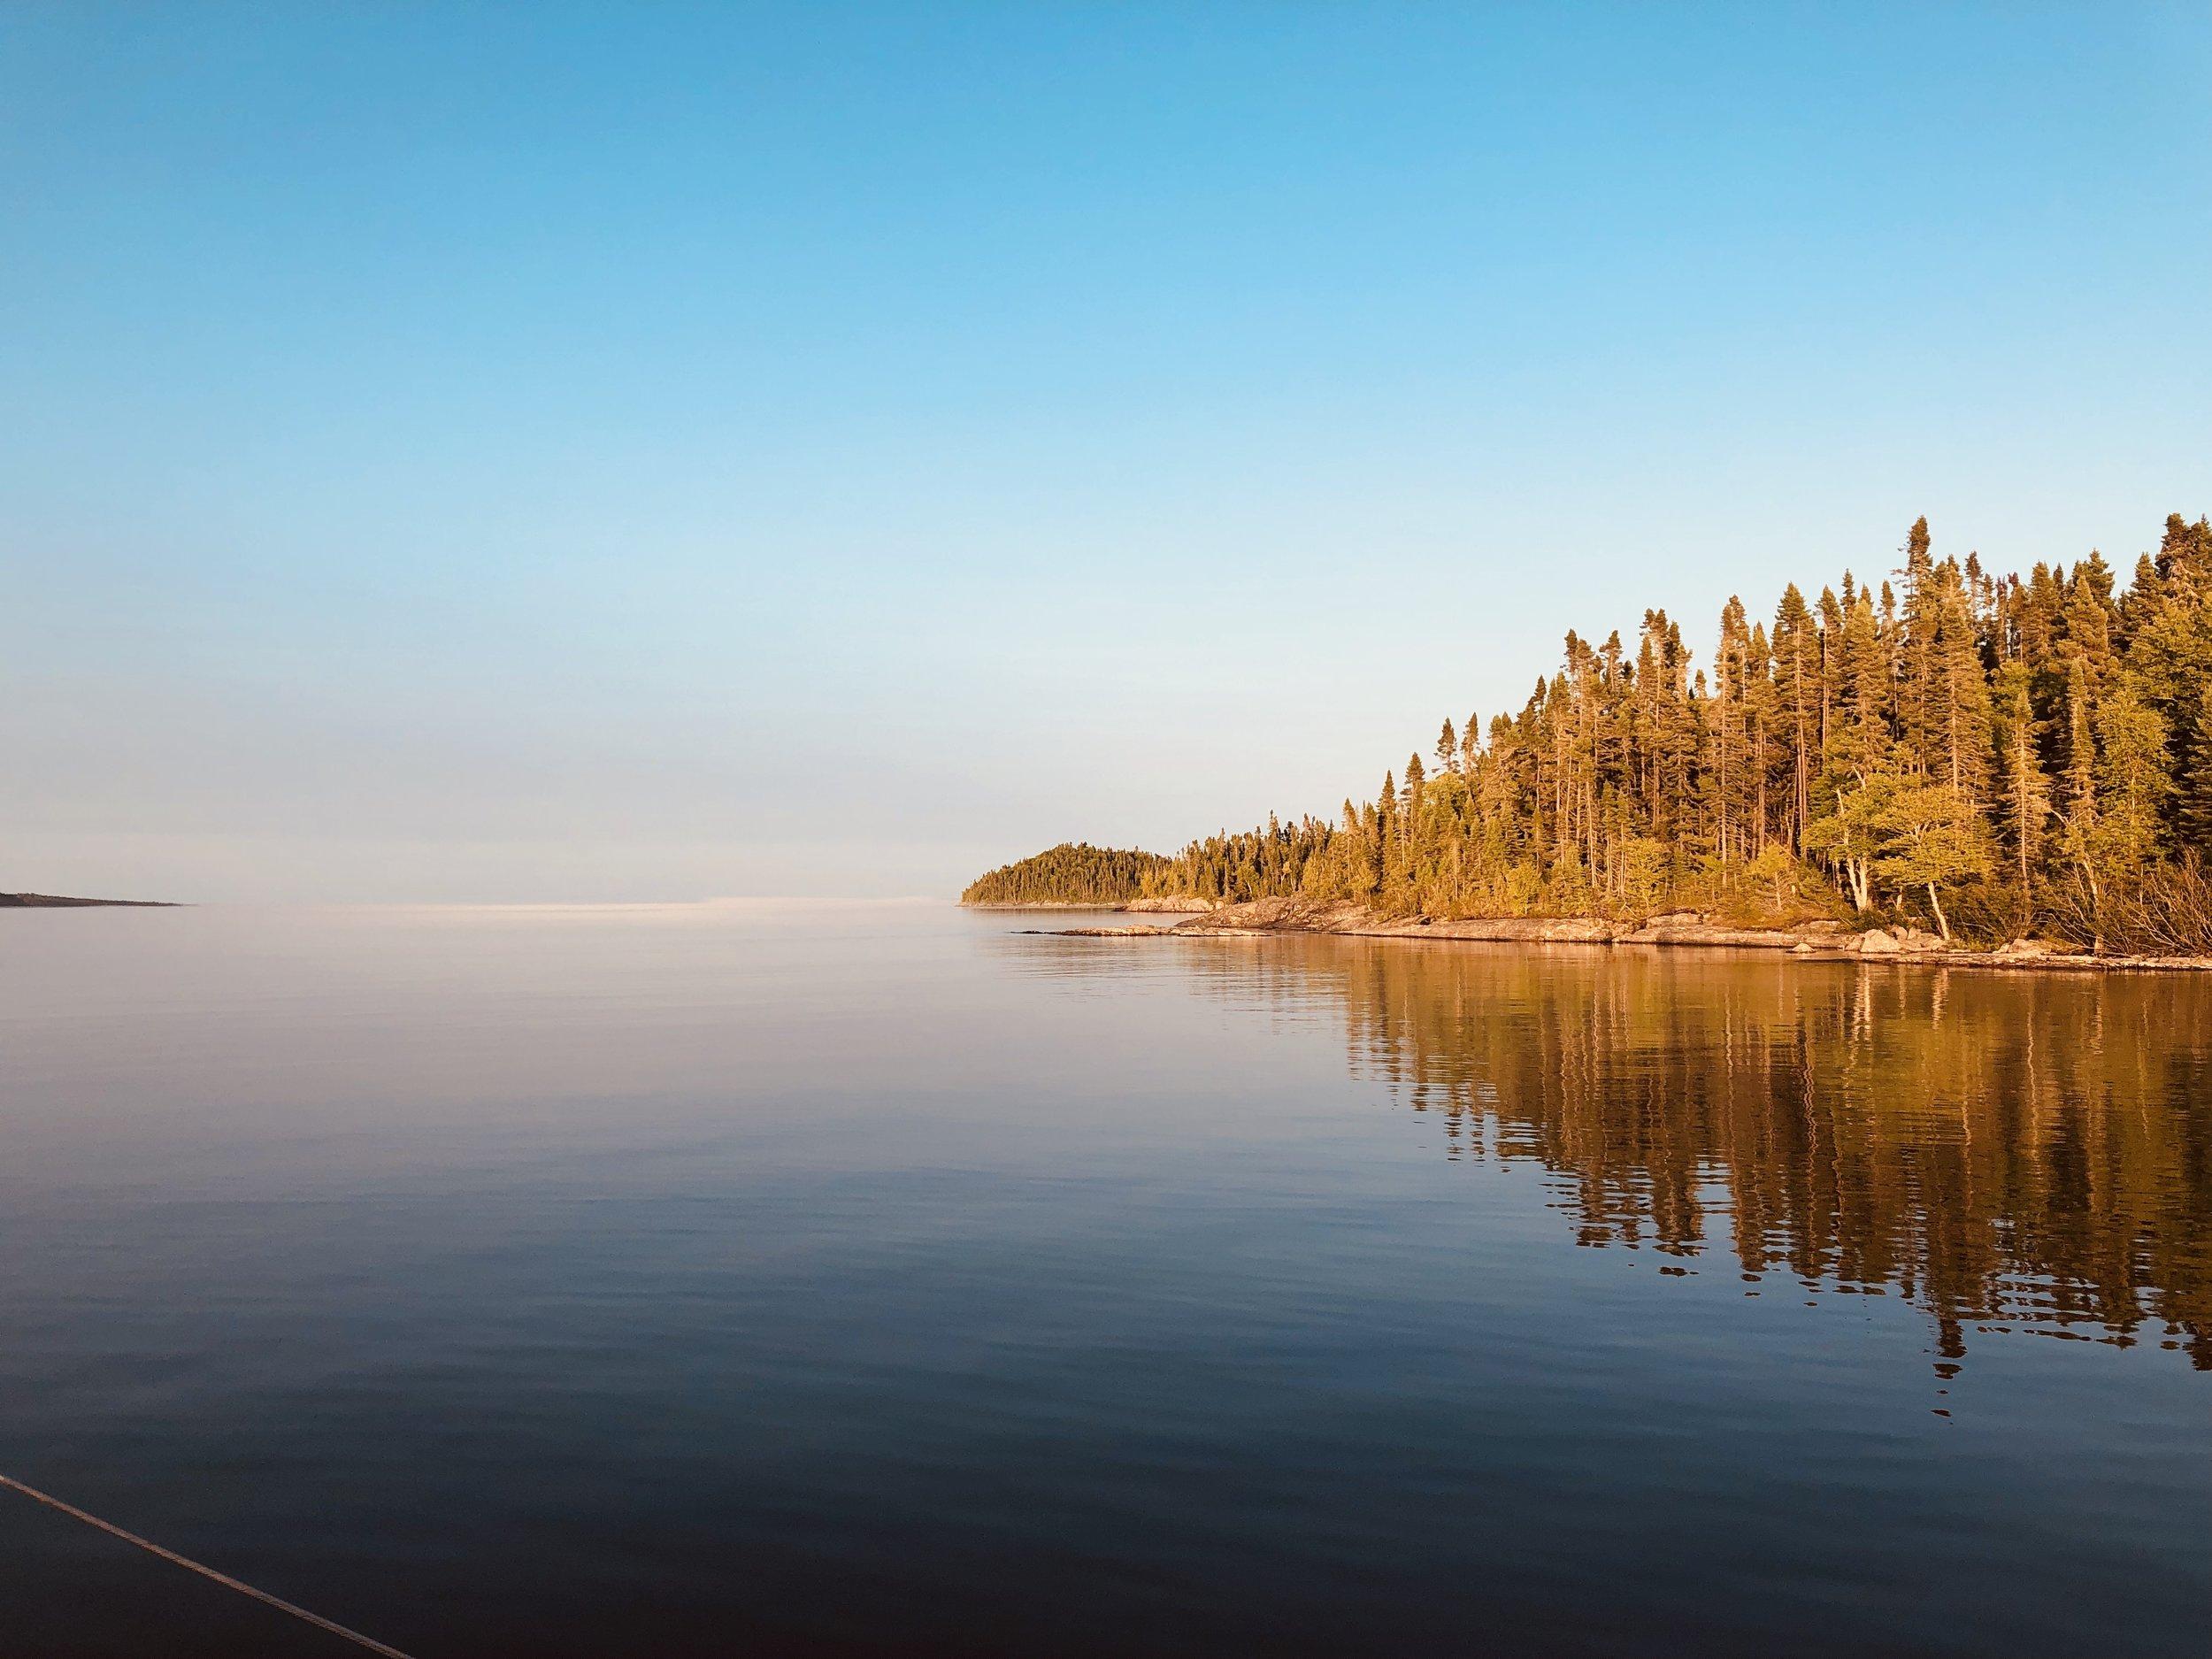 Anchored off Suzy Island, near the Canadian border